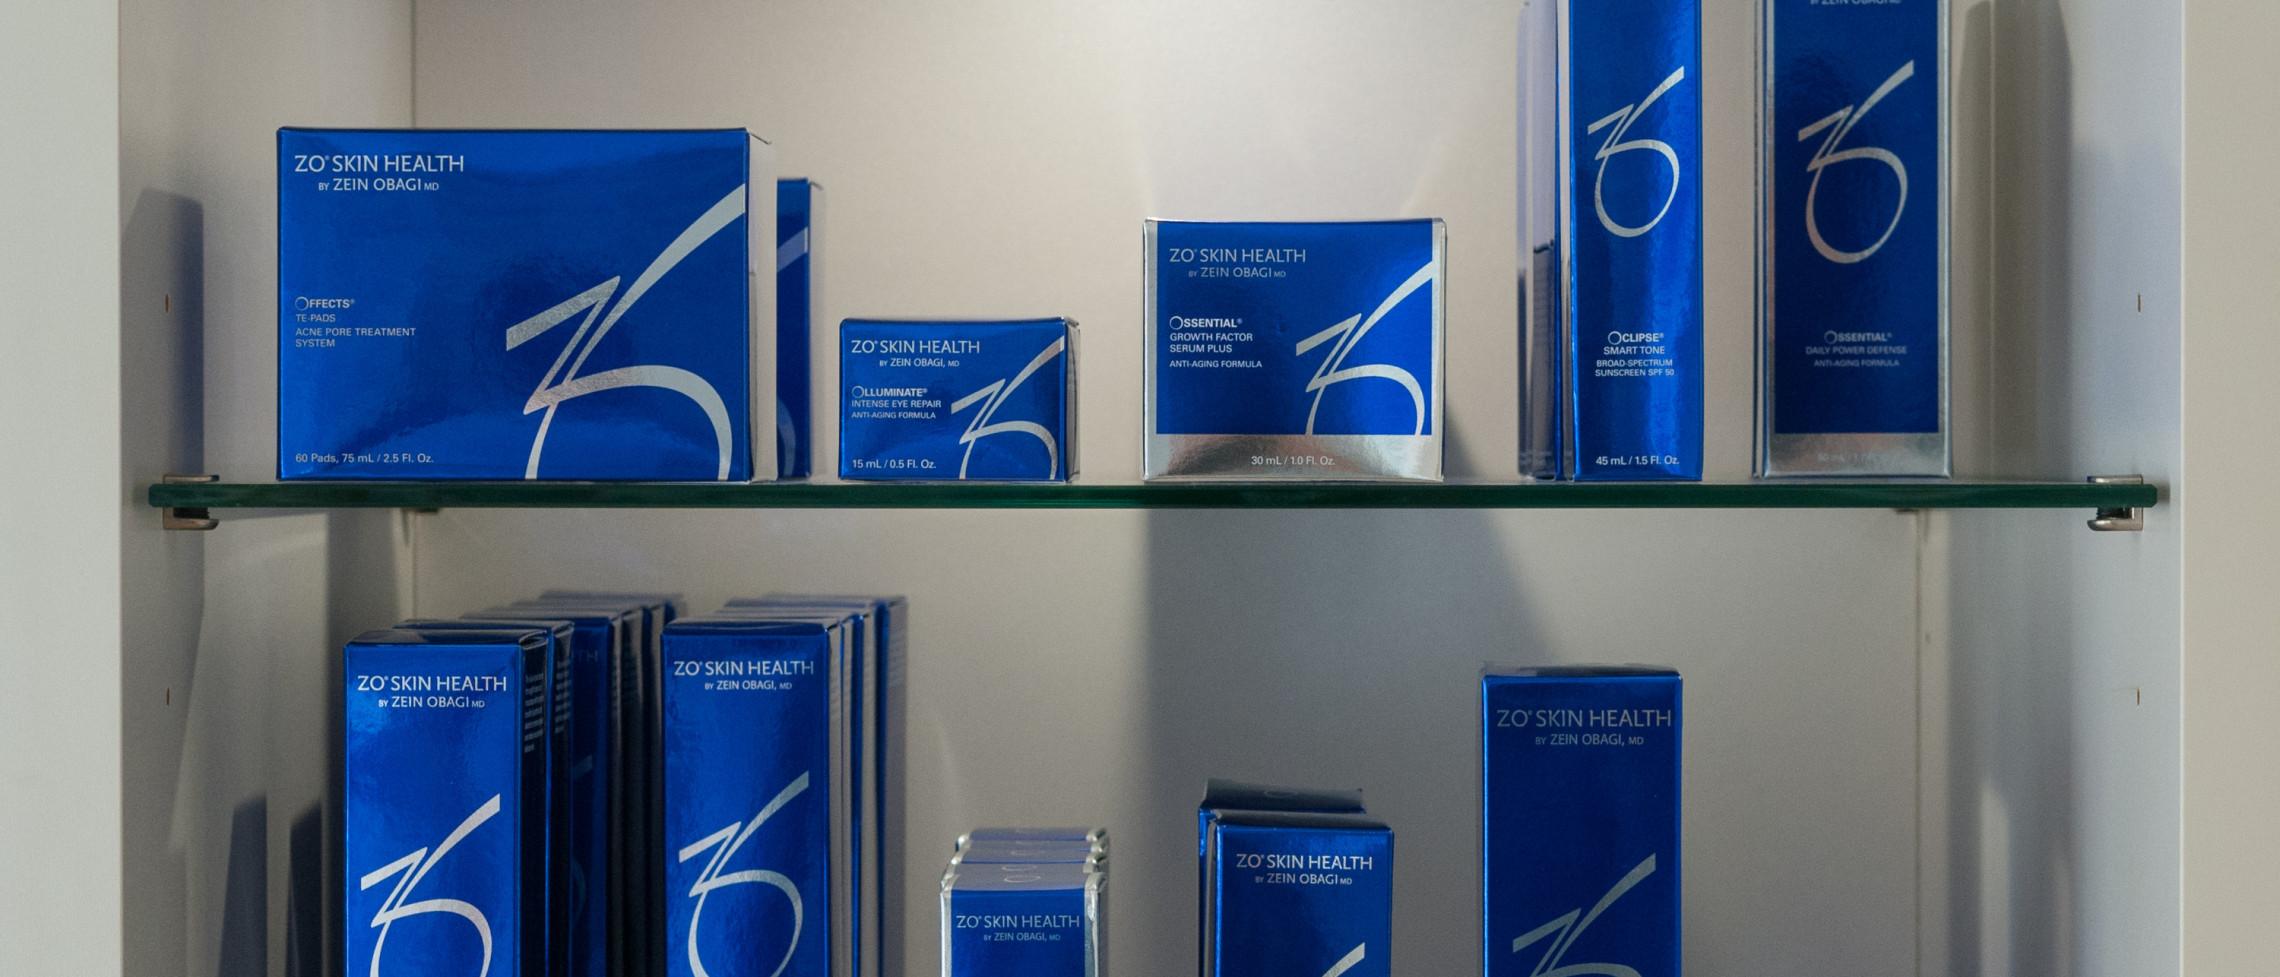 Clinetix Rejuvenation Bothwell - ZO Skinhealth Products